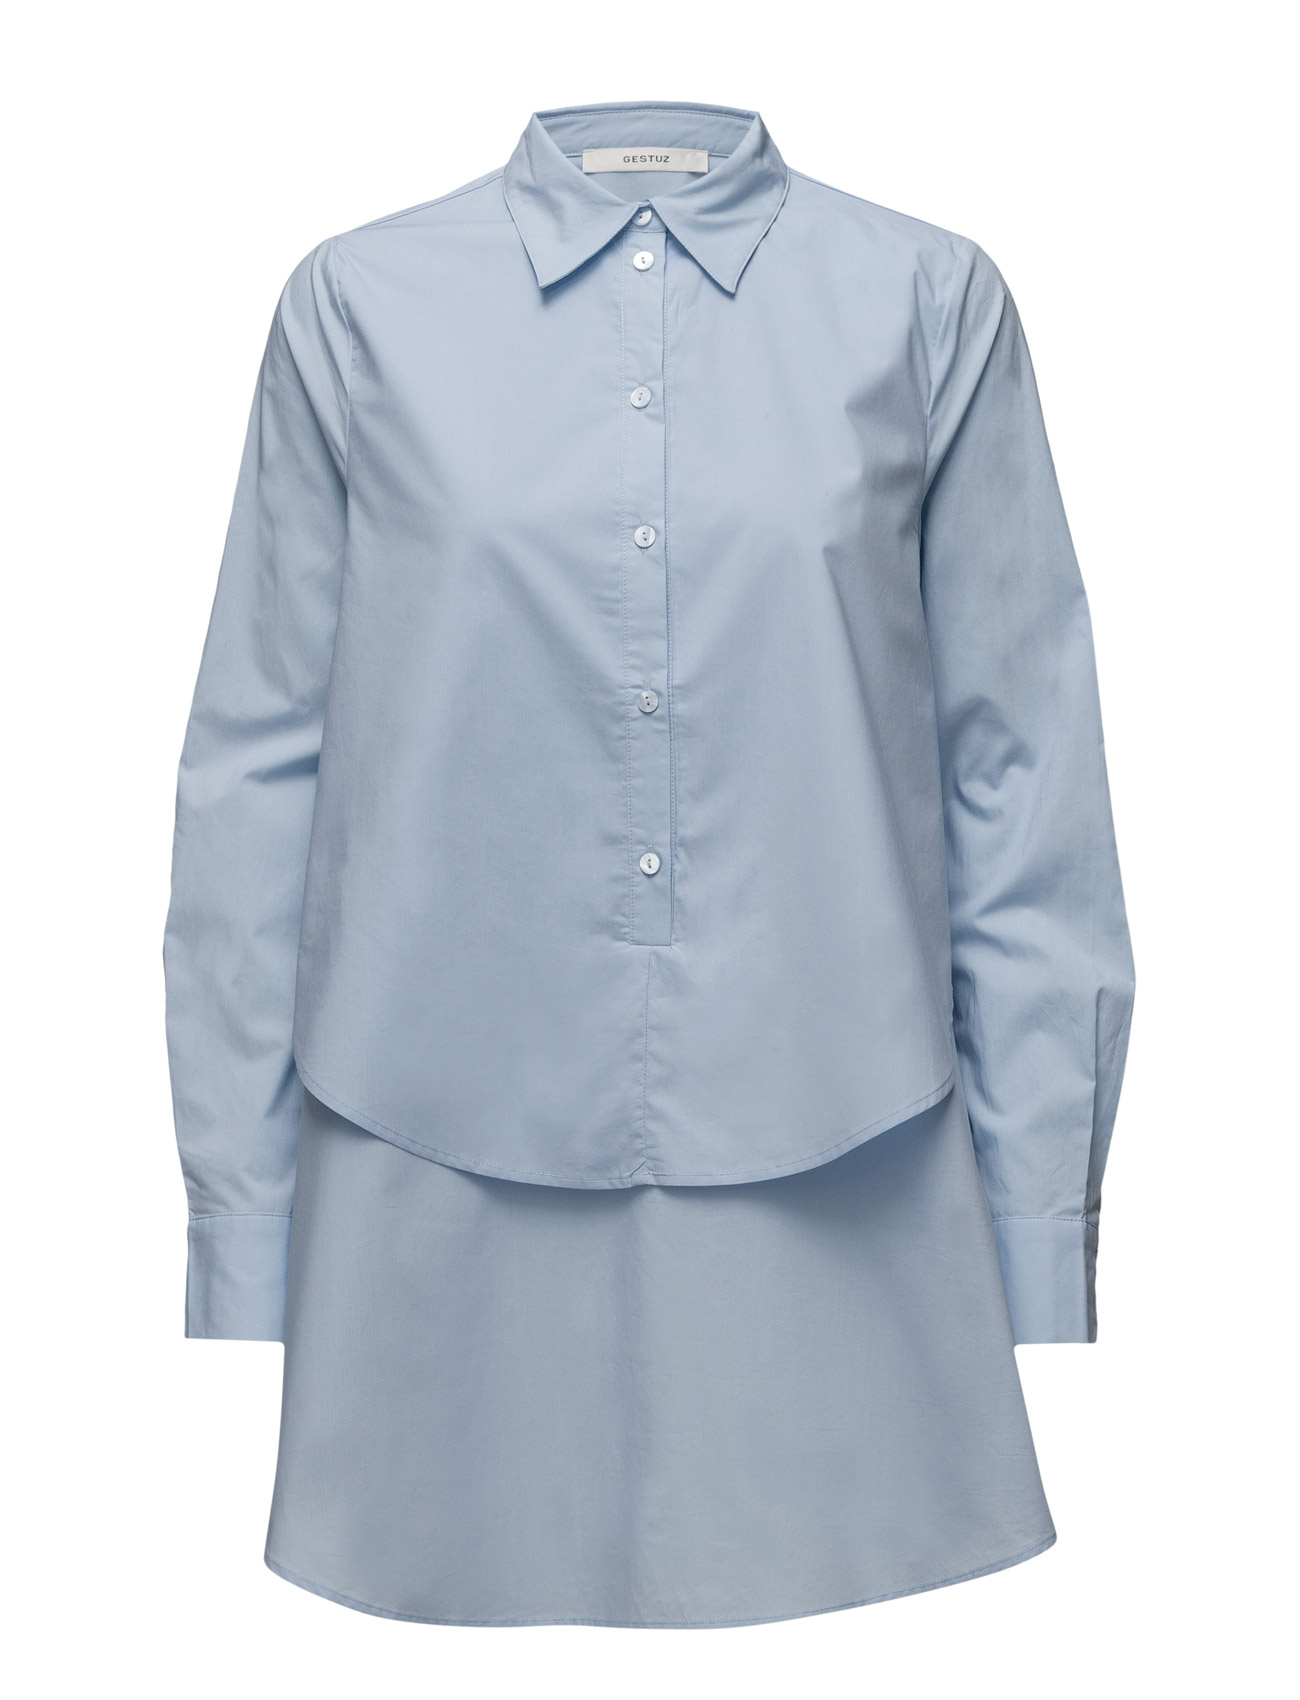 Ira Shirt So17 Gestuz Trøjer til Kvinder i Kentucky Blå